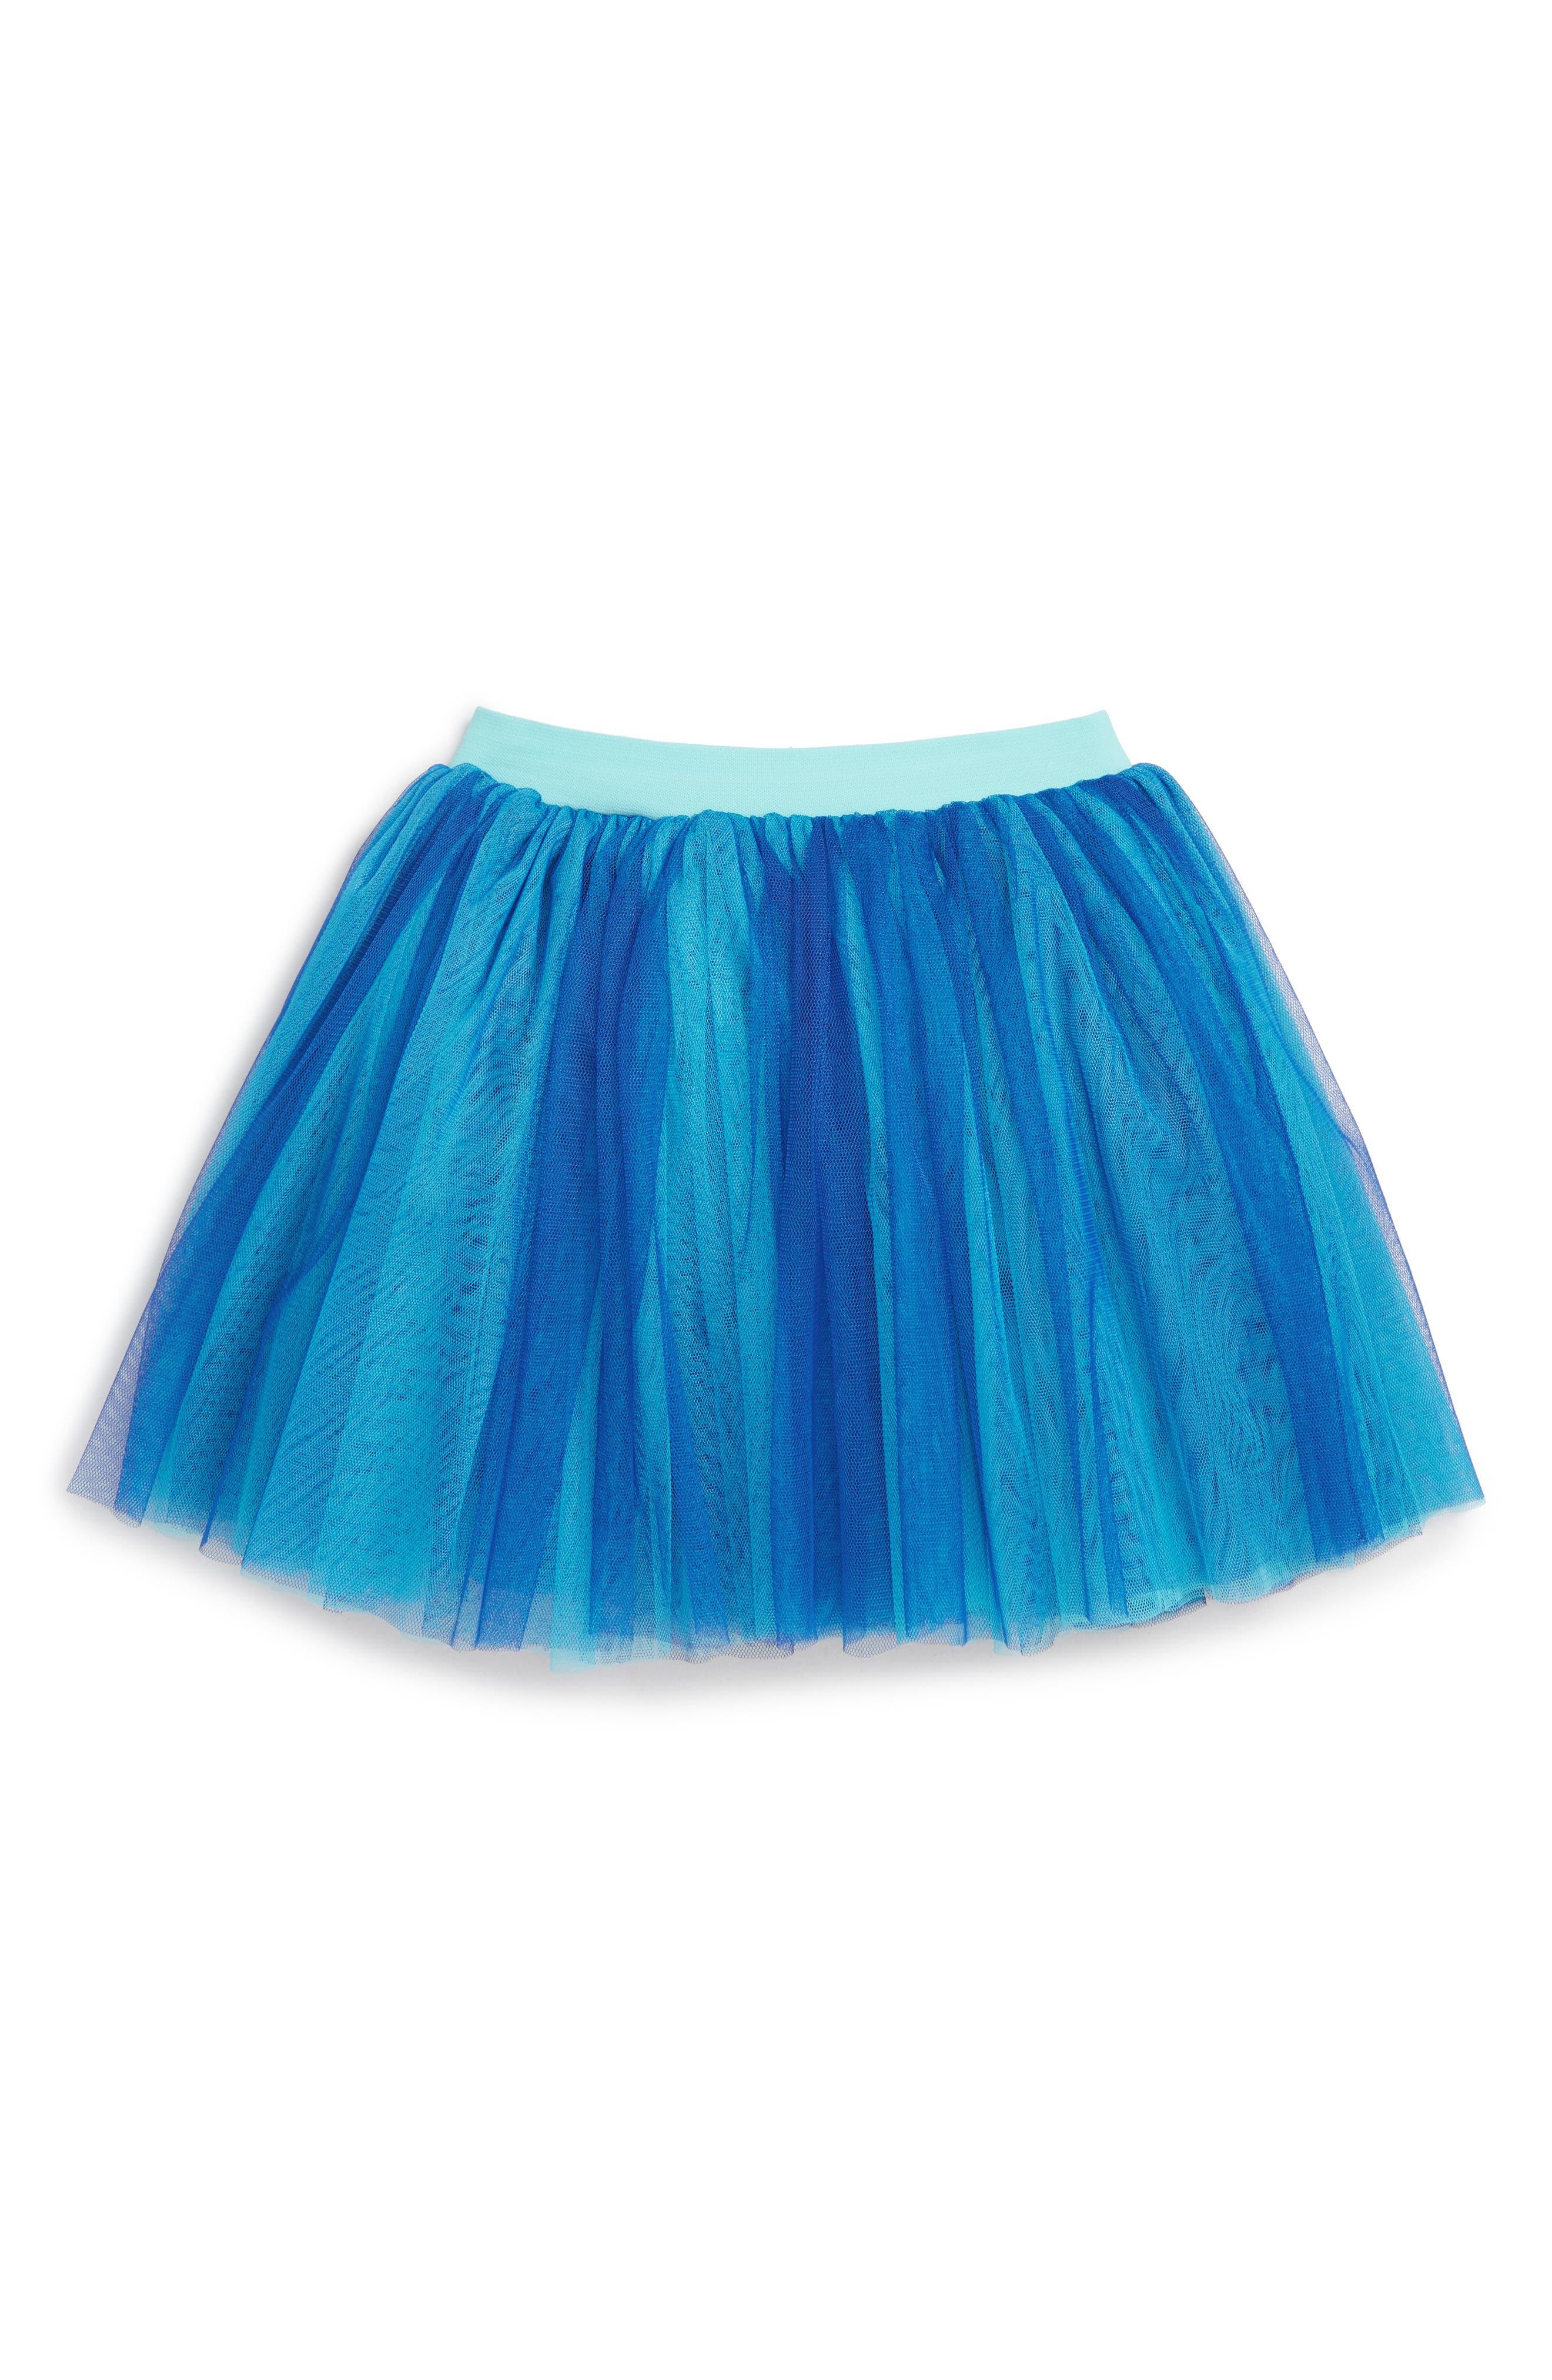 Girls Truly Me Tutu Skirt Size 4  Blue